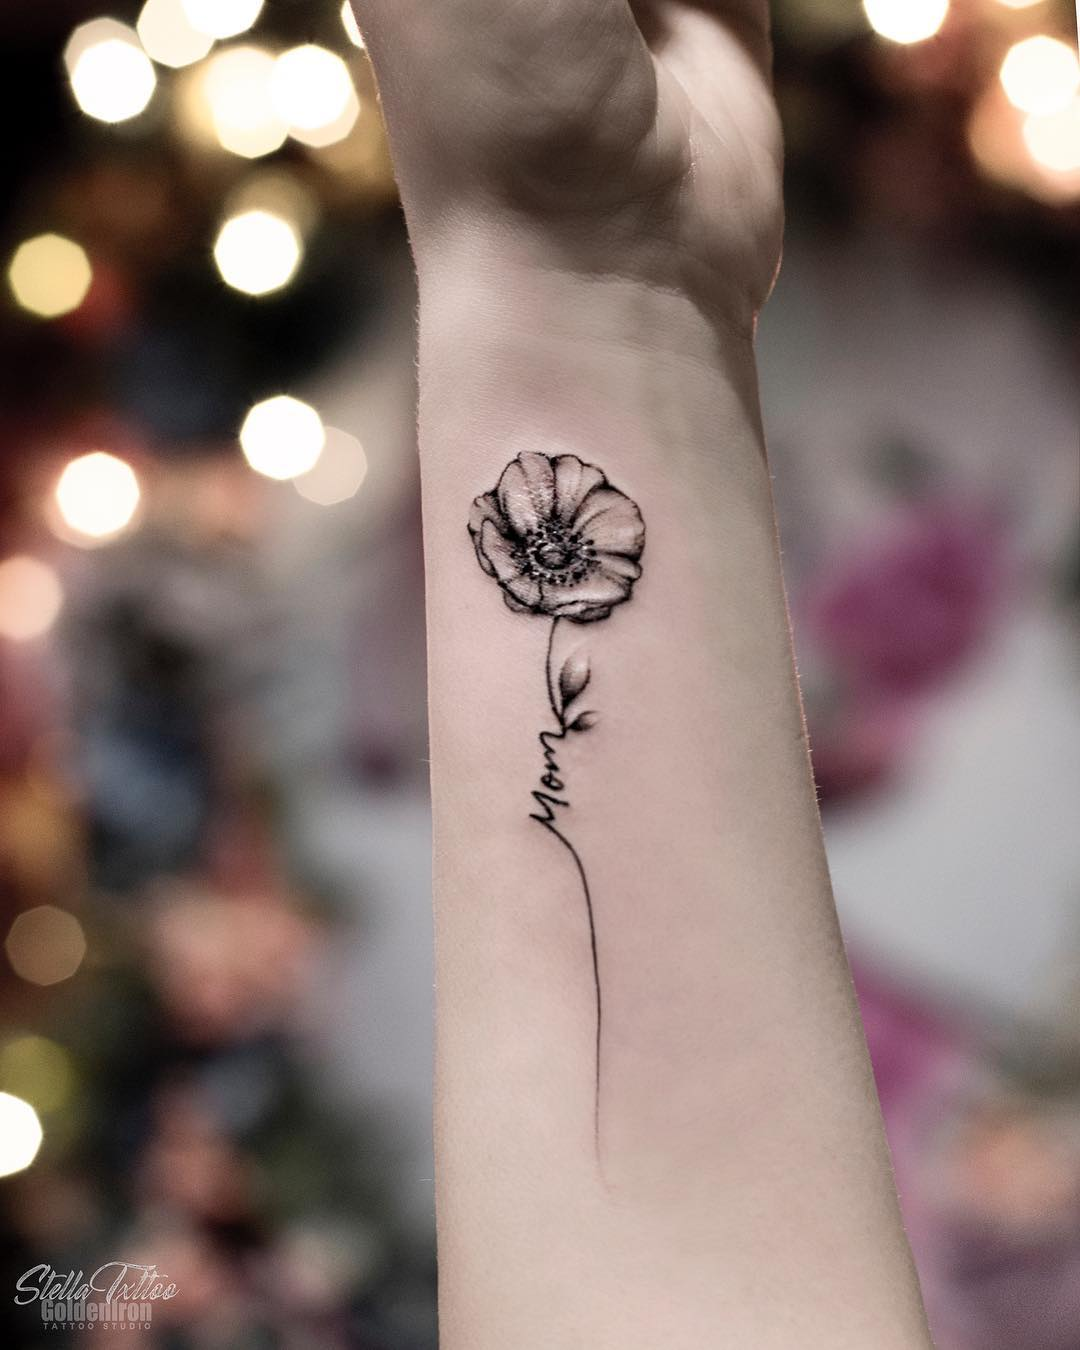 floral arm tattoos design; mini tattoos, simple tattoo, beautiful tattoos, sex tattoos, mini tattoos, meaningful tattoos; chic tattoos